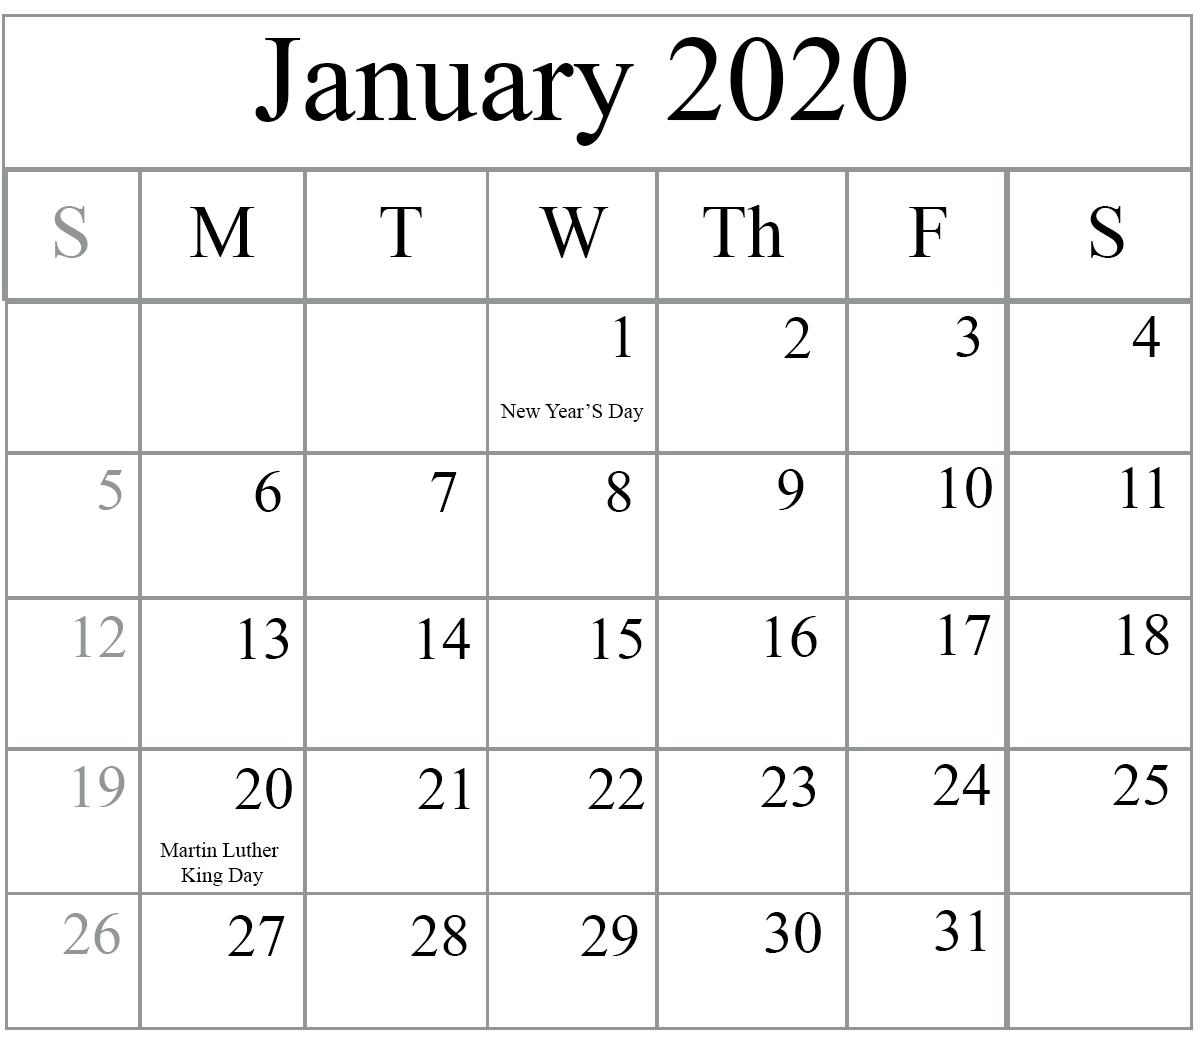 Free Blank January 2020 Calendar Printable In Pdf, Word-January 2020 Fillable Calendar